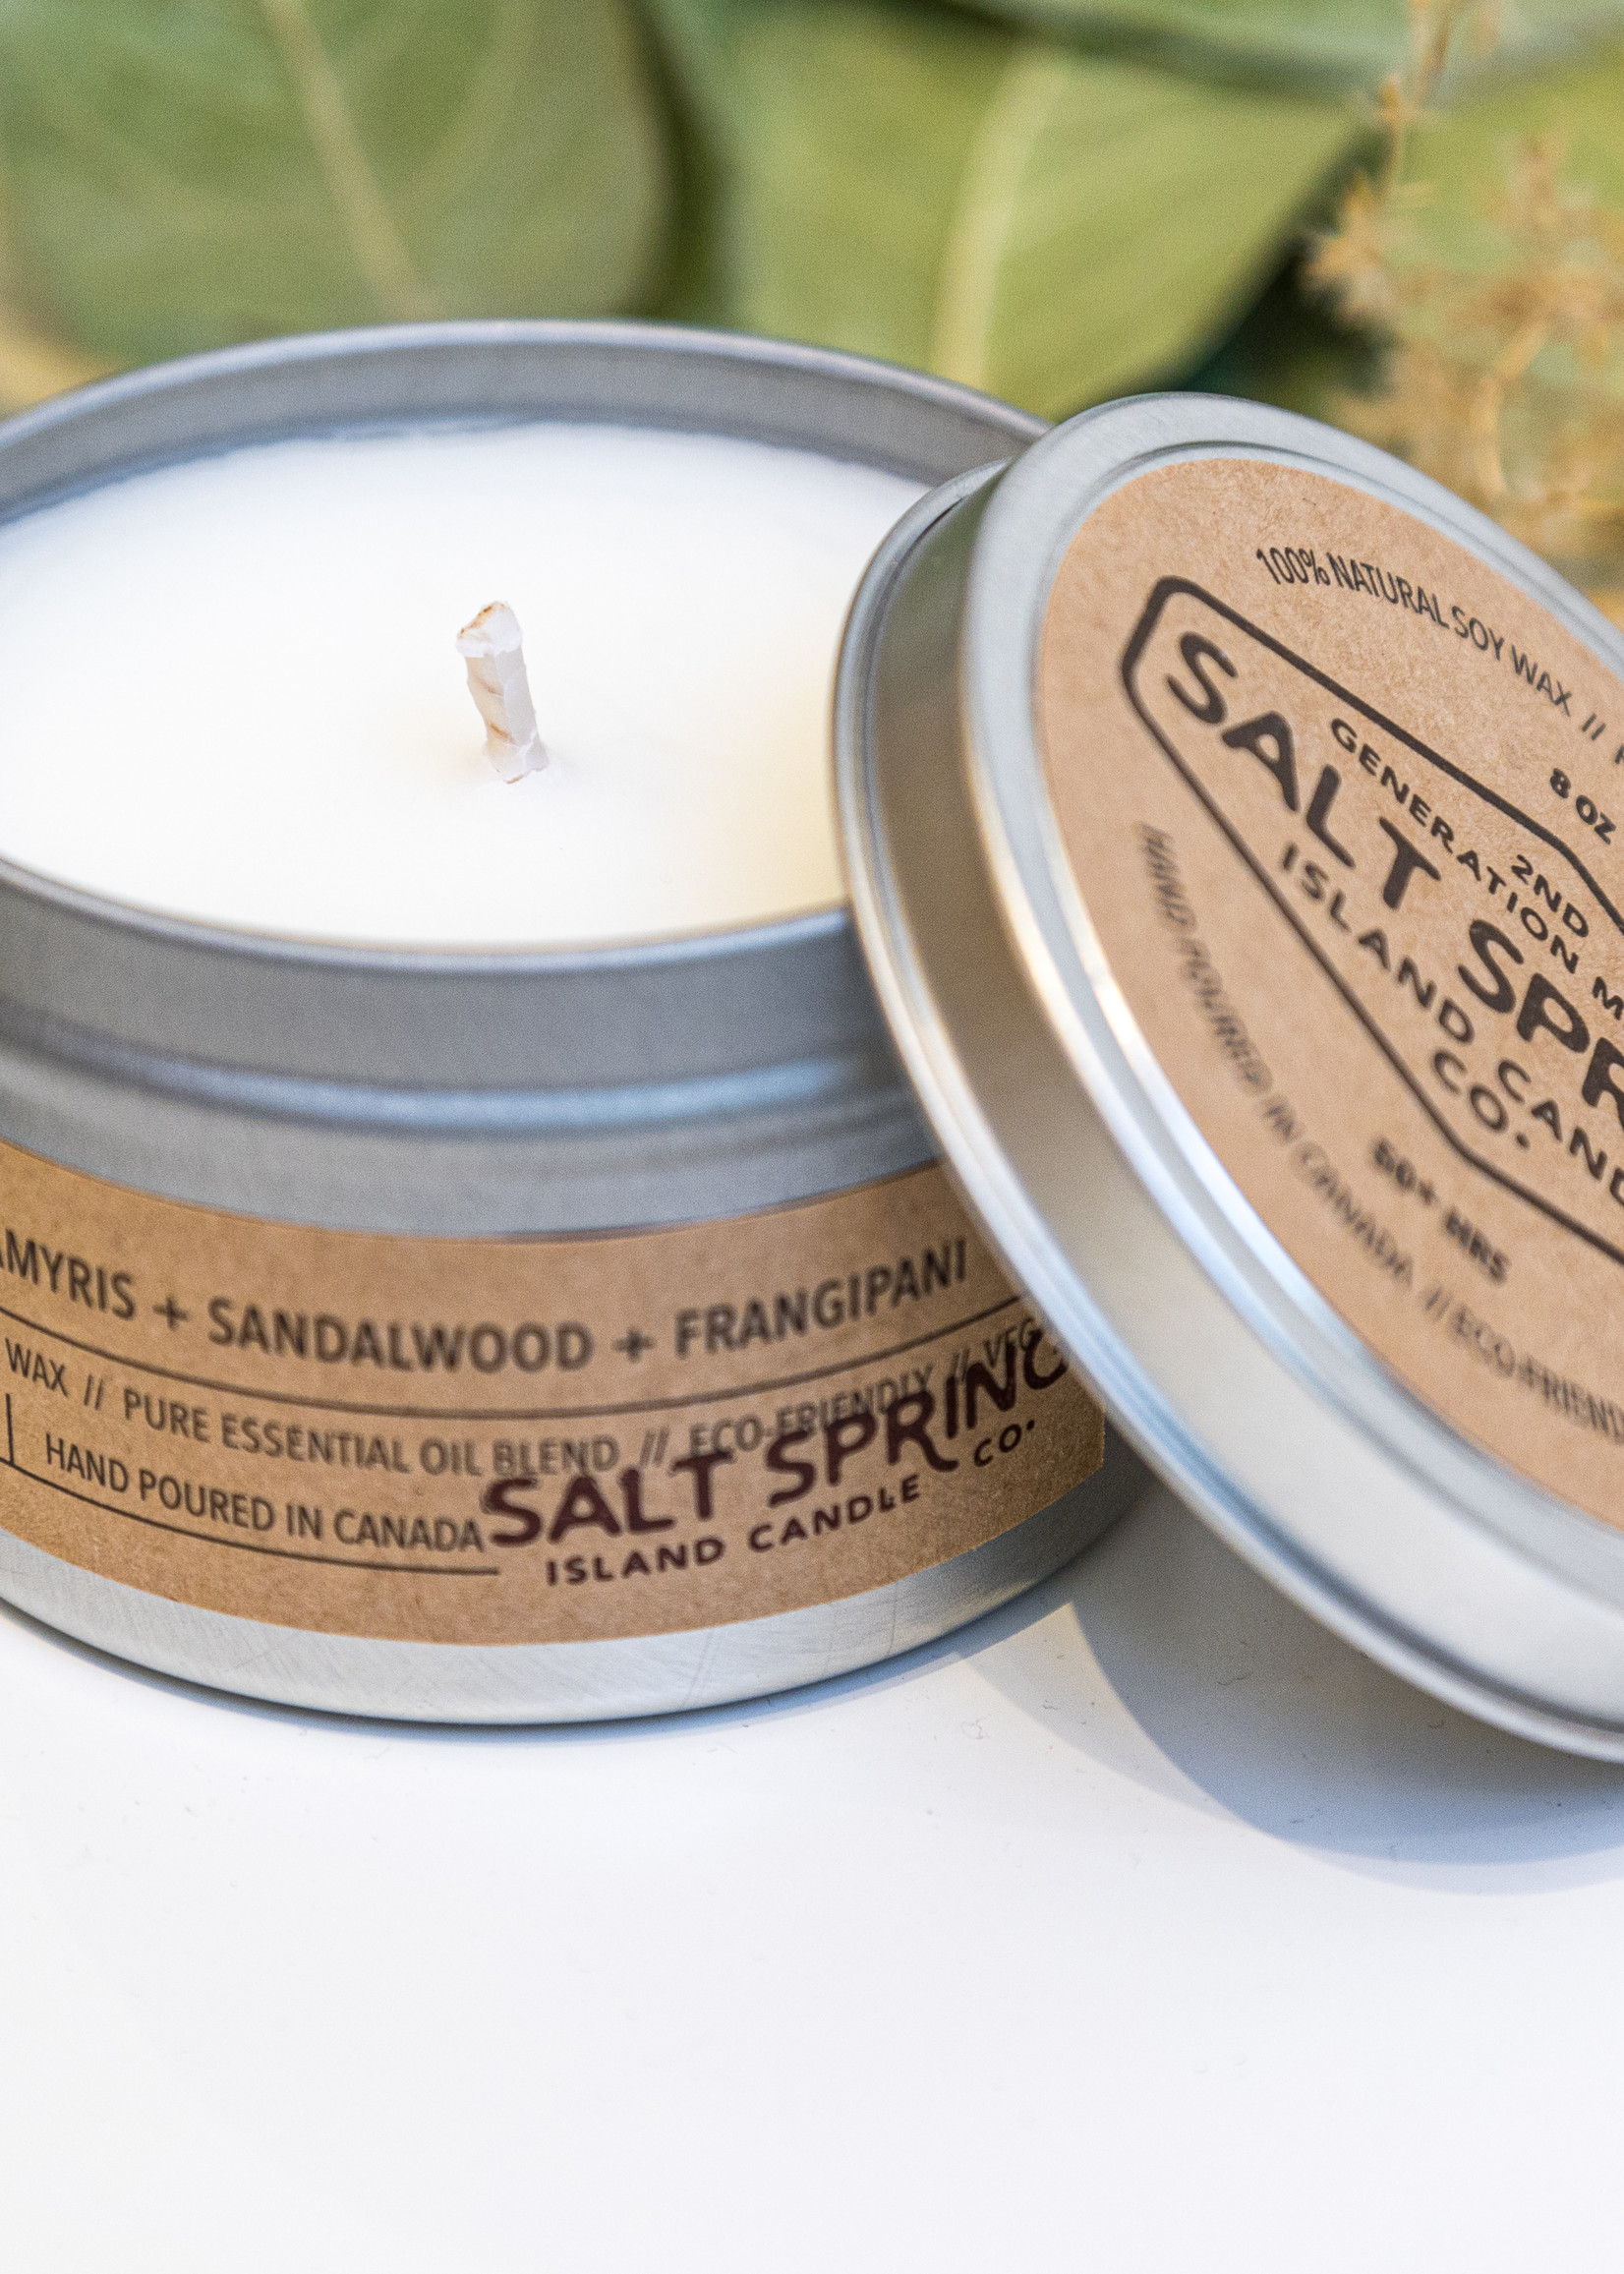 Salt Spring Island Candle Co. - Yoga 8 oz Candle